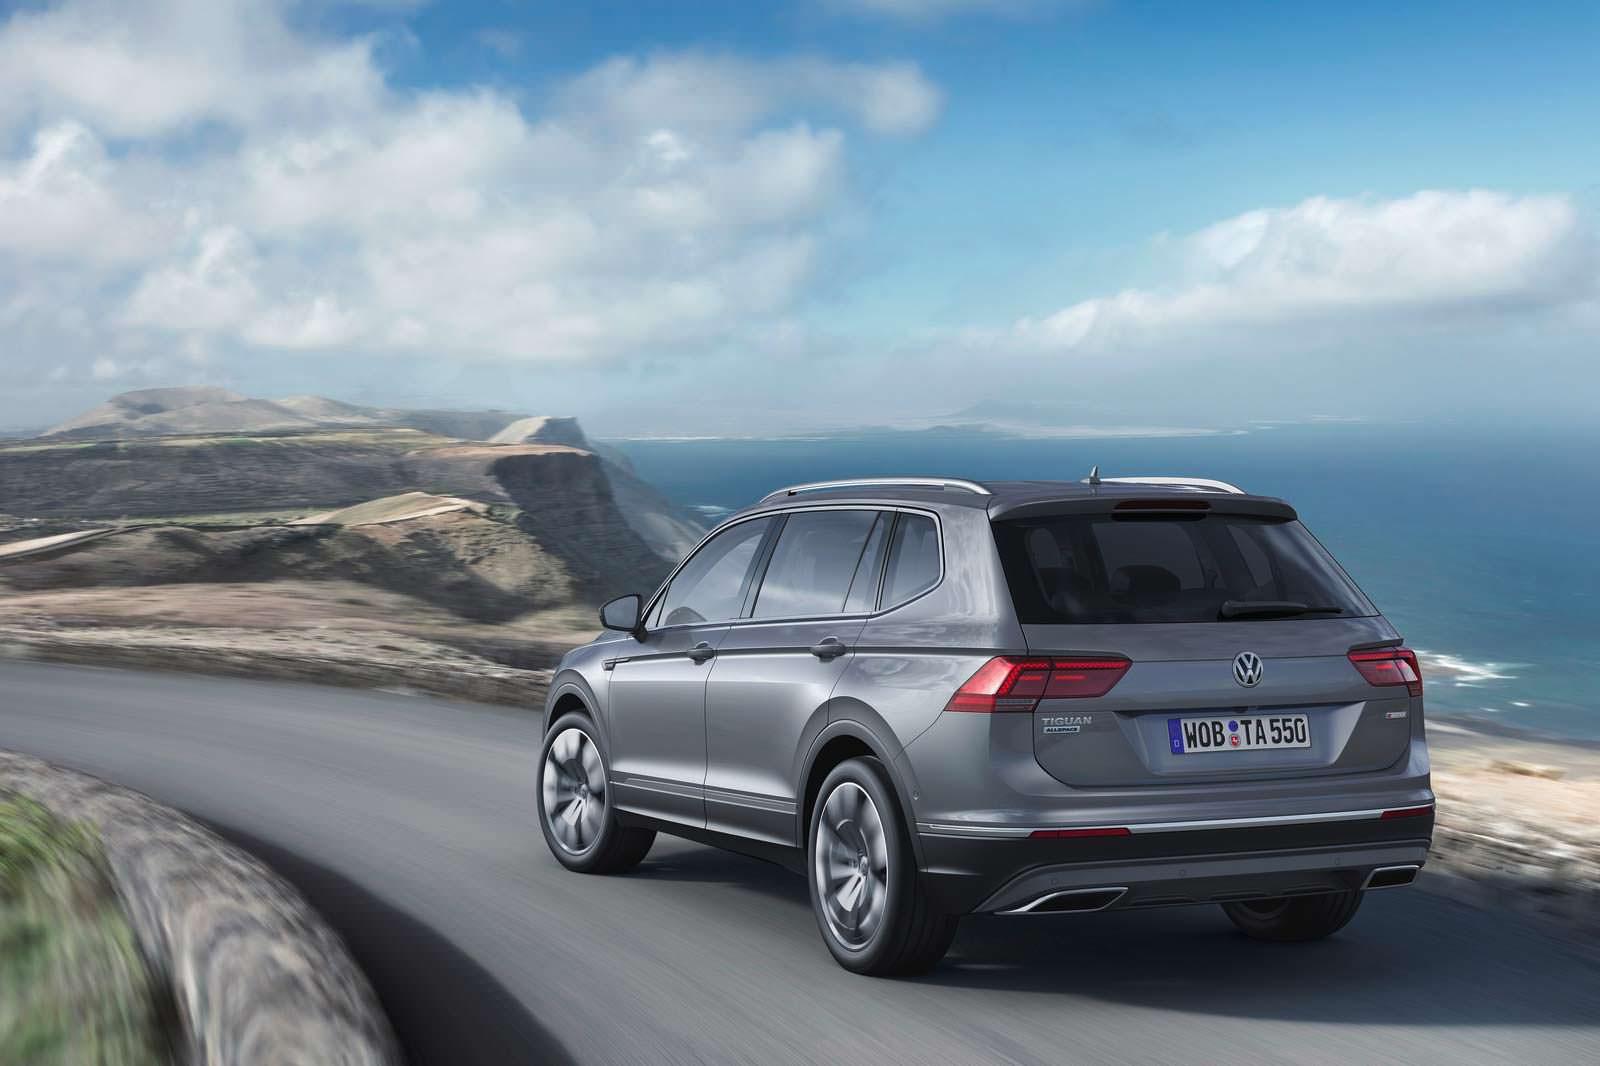 Семиместный Volkswagen Tiguan Allspace 2017